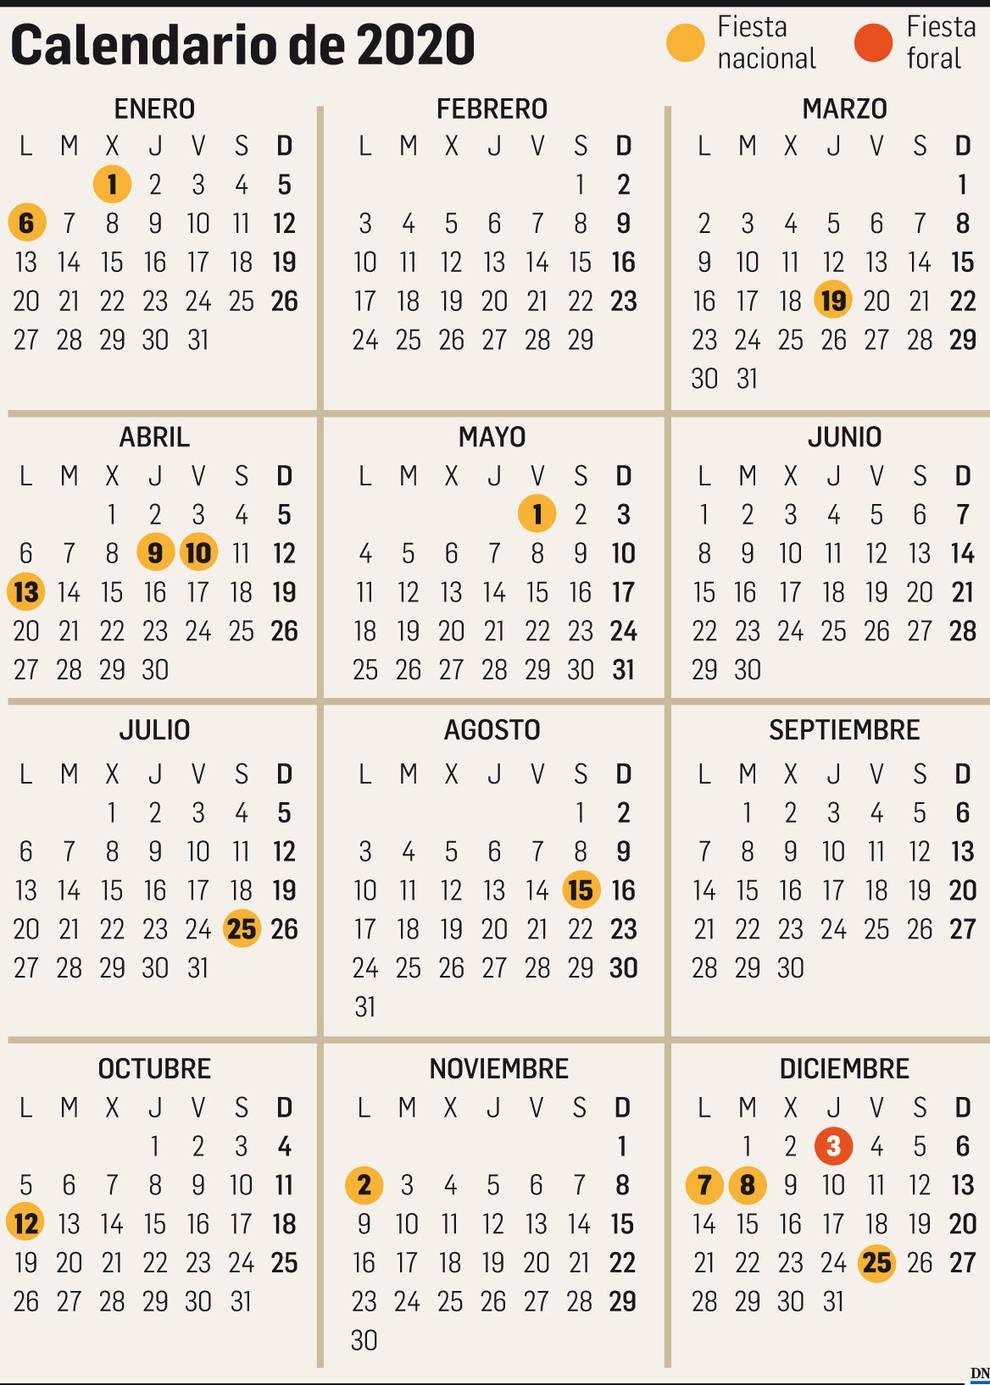 que dia cae semana santa 2020